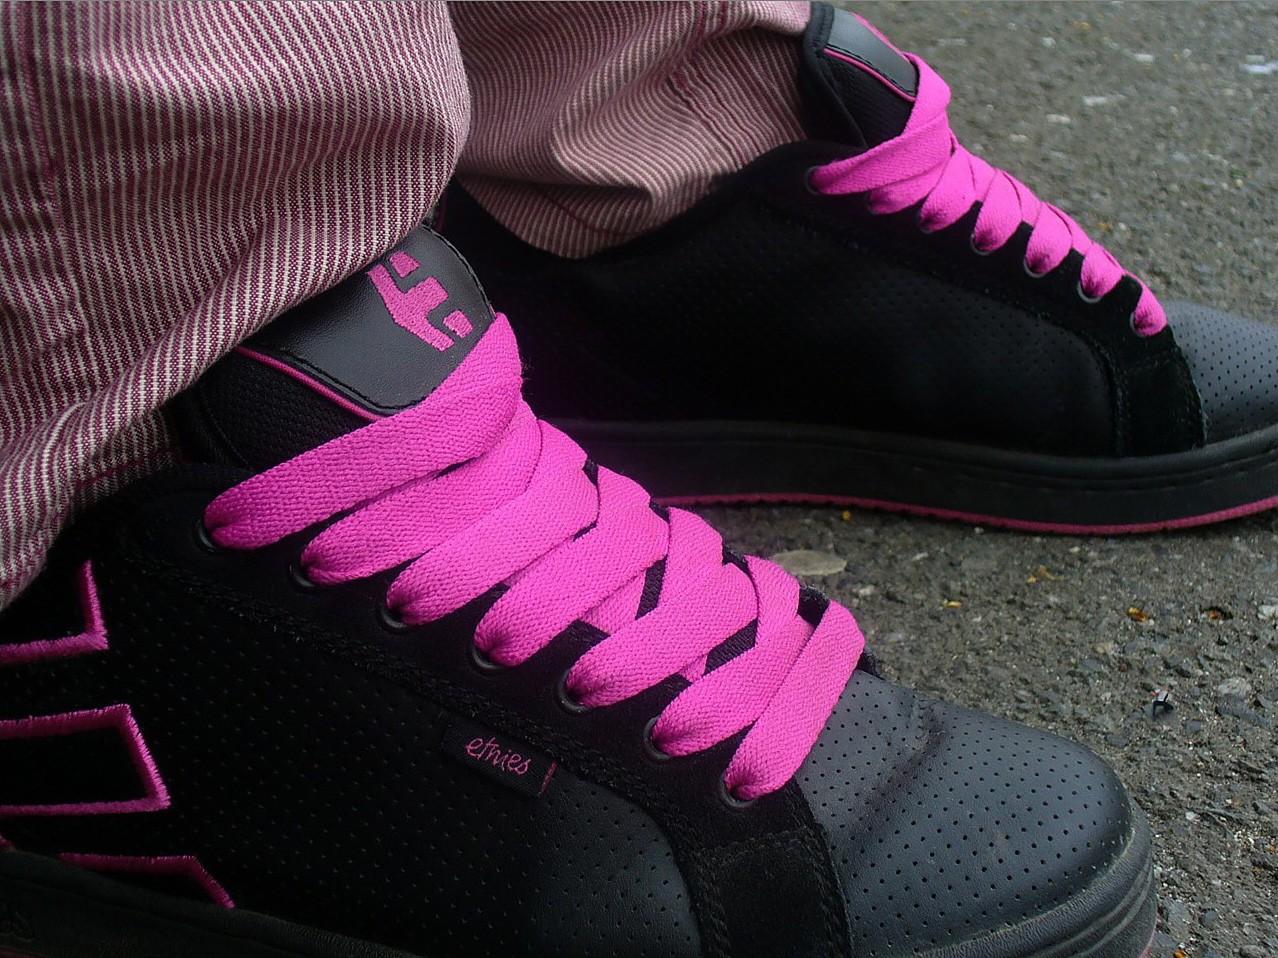 Sfondi : bianca, nero, rosso, viola, scarpe da ginnastica